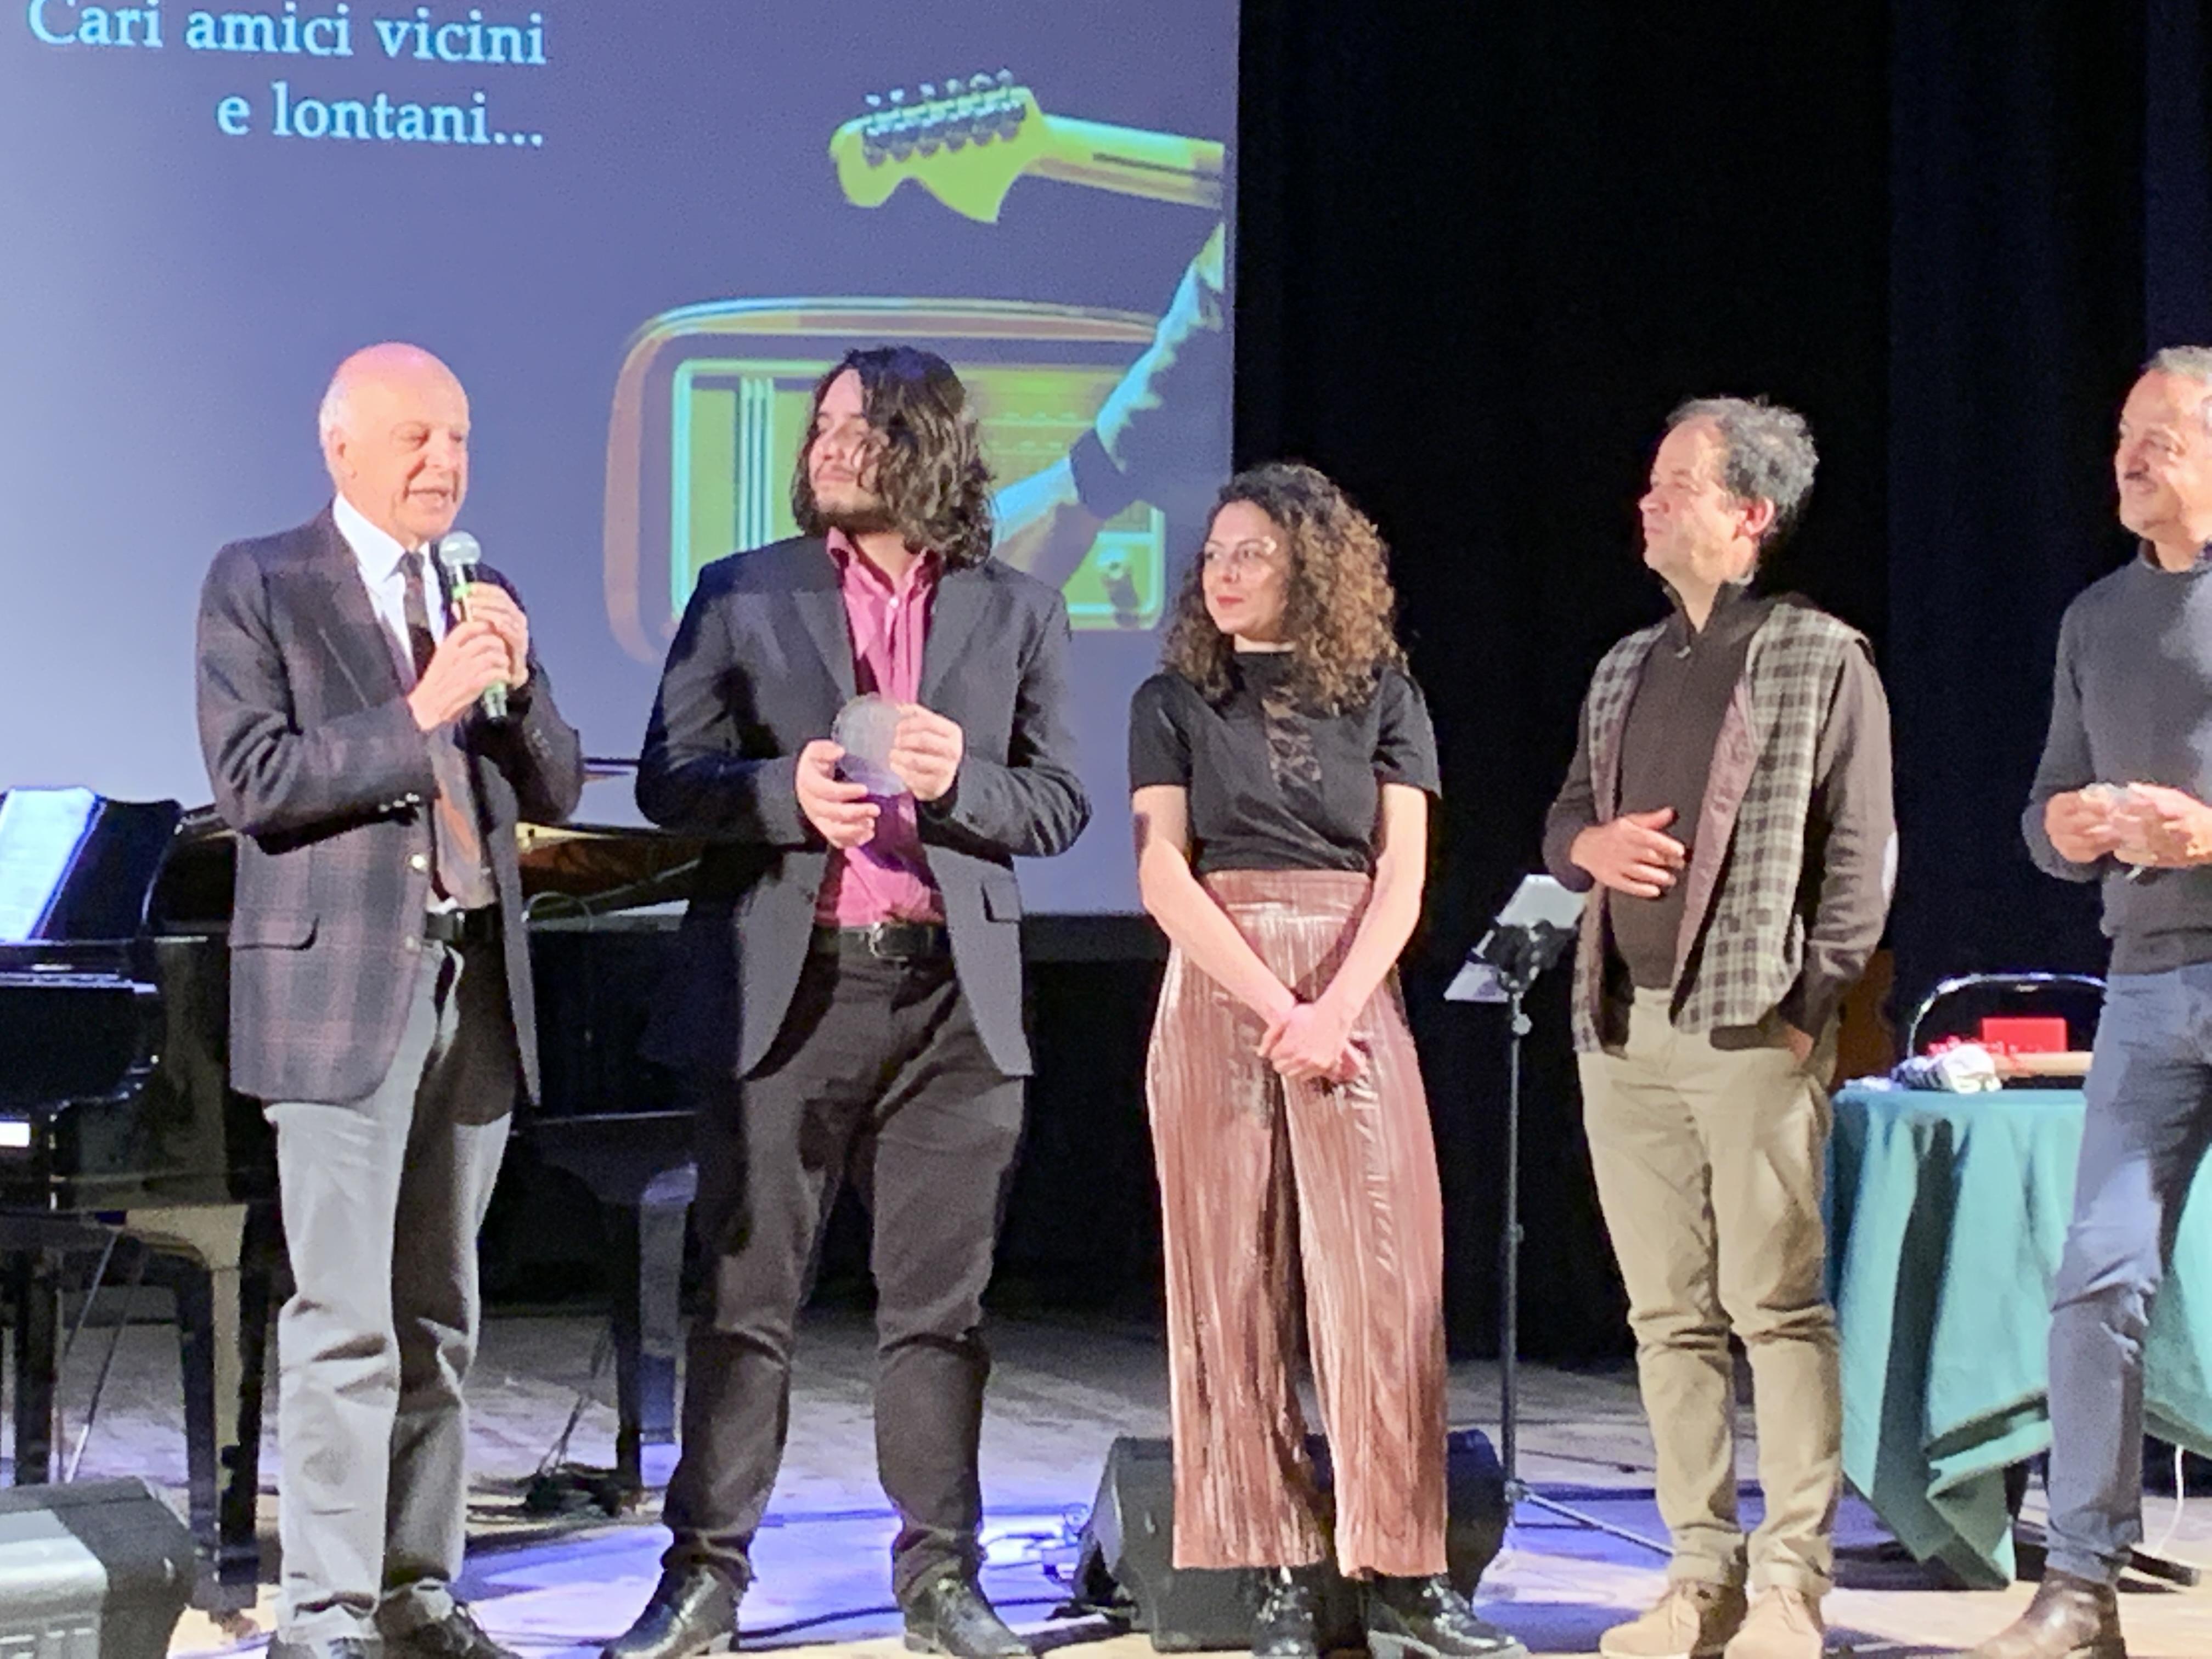 A Macerata Francesco Lettieri, vincitore di Musicultura 2019